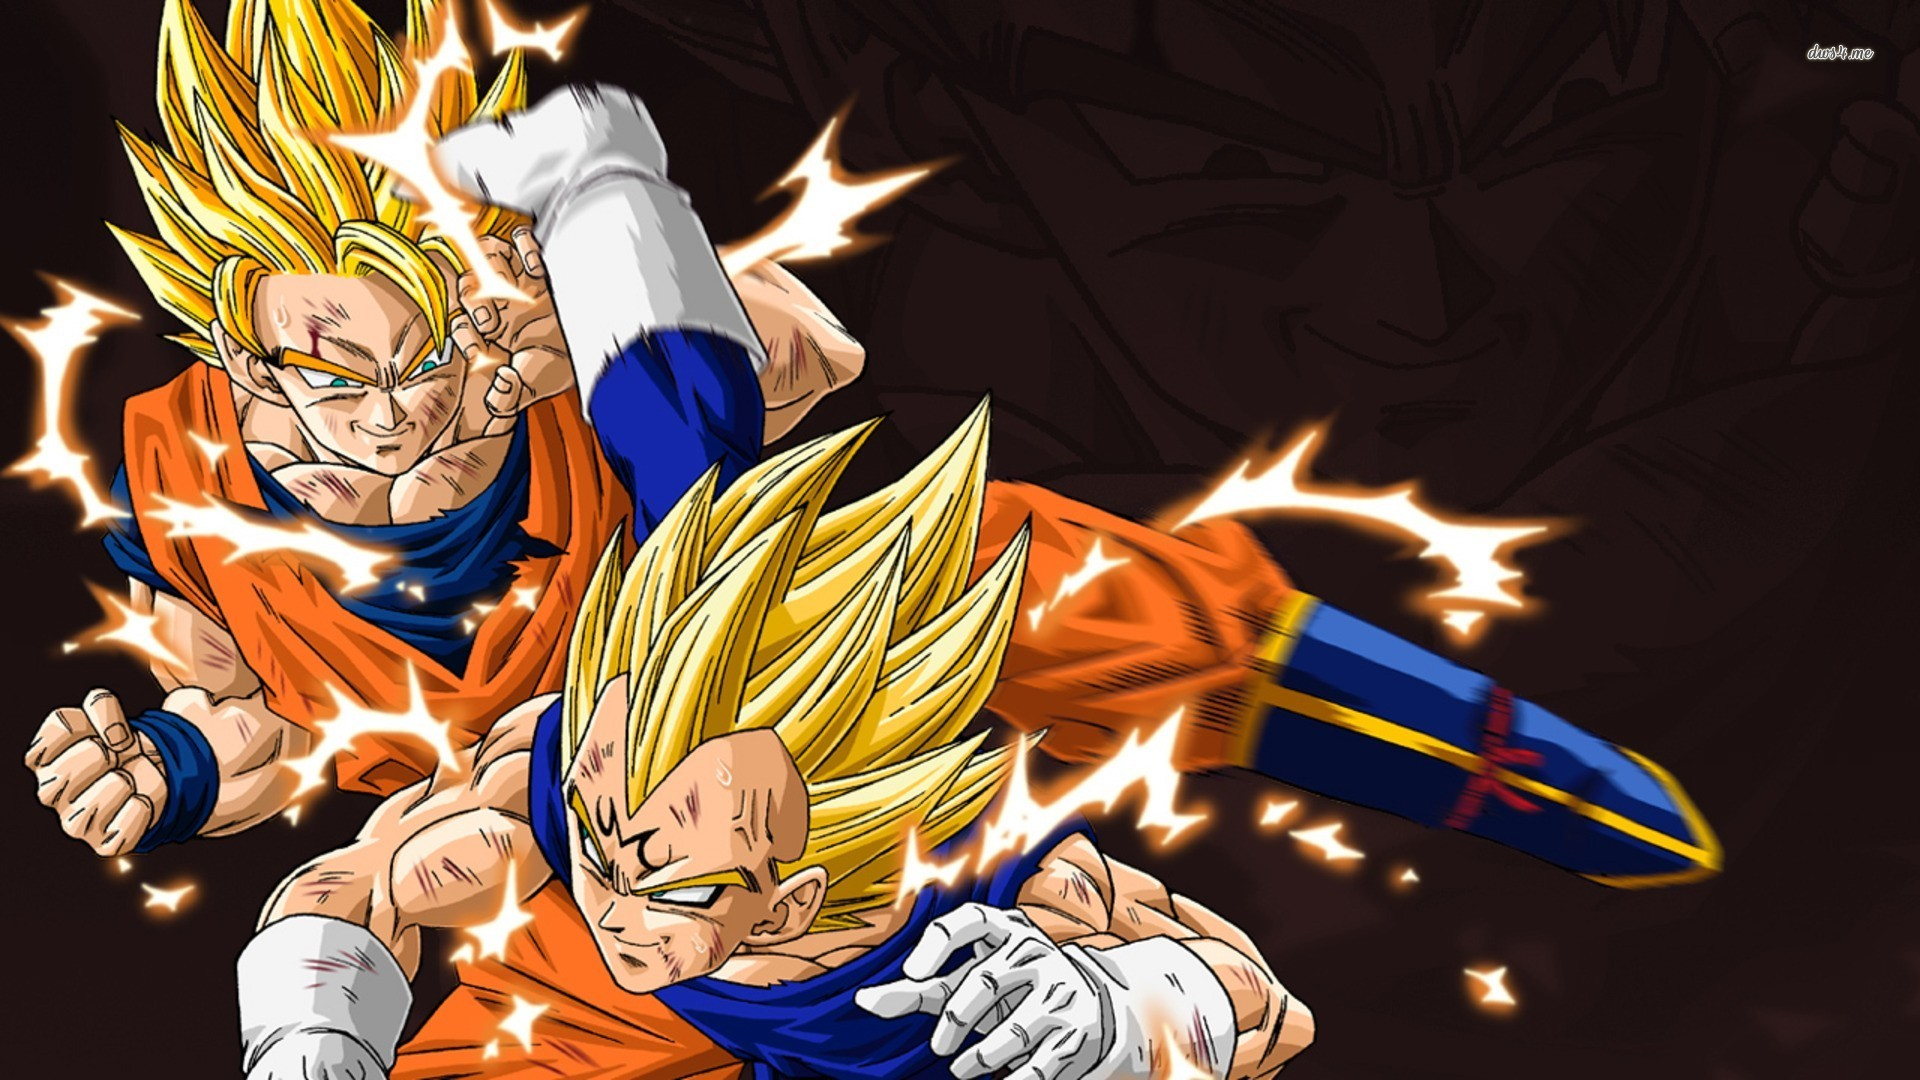 Free Download Vegeta And Goku Dragon Ball Z Wallpaper Anime